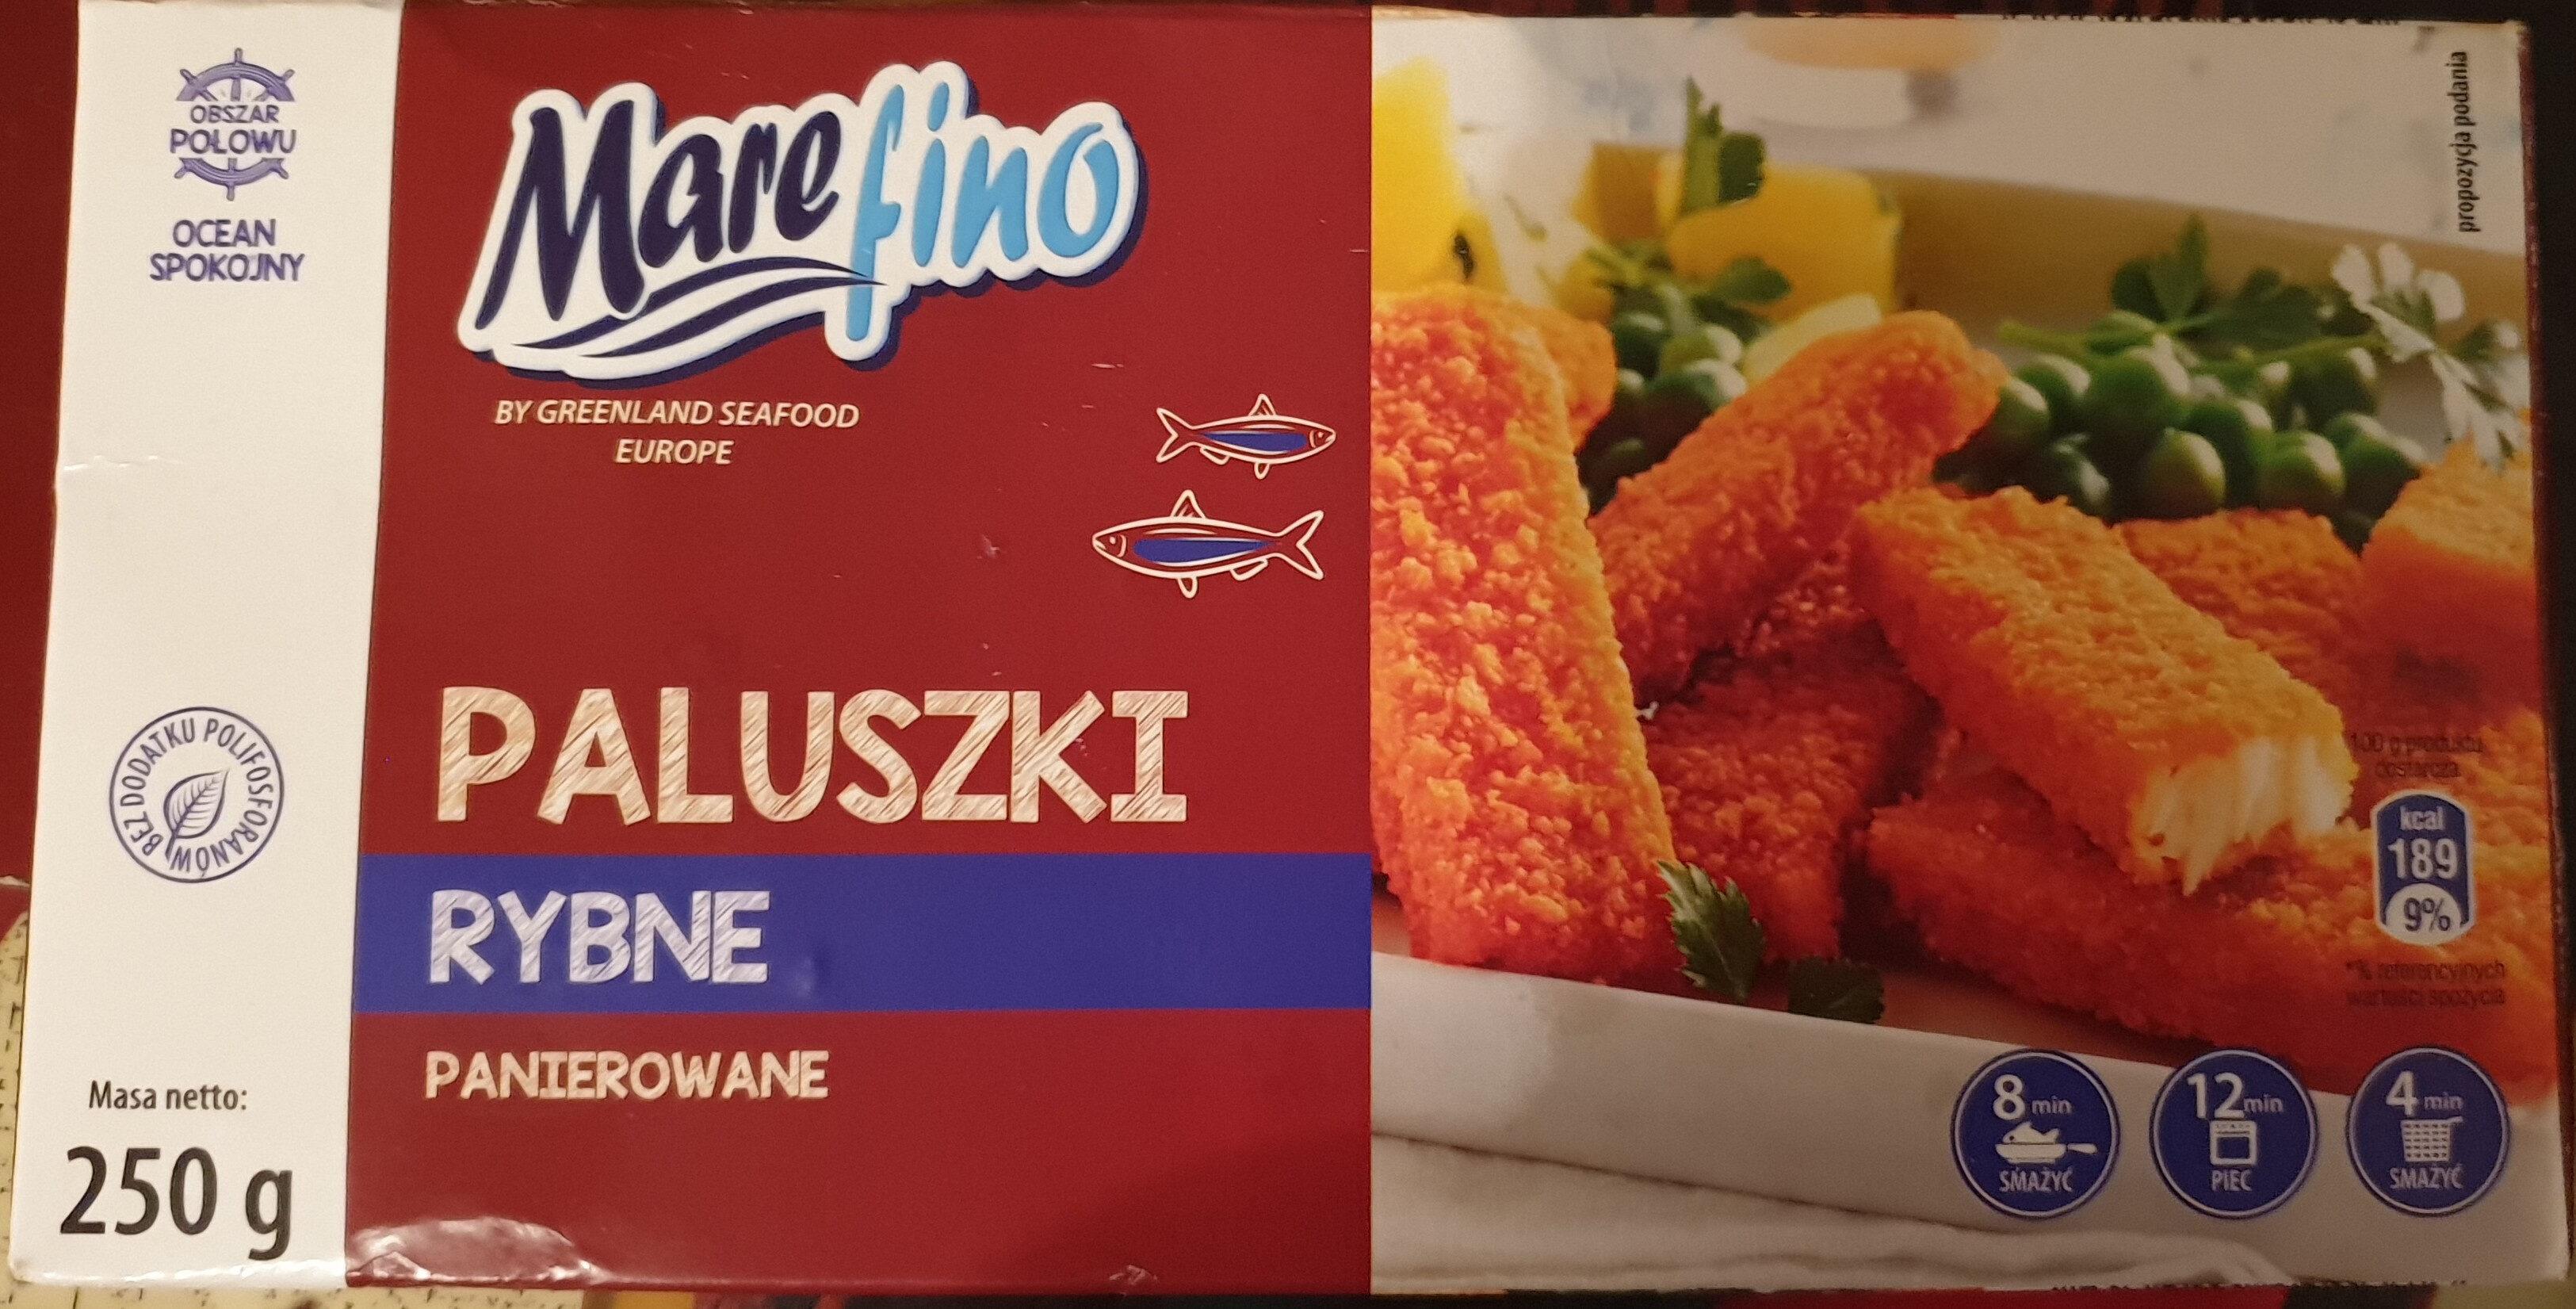 Paluszki rybne panierowane - Product - pl